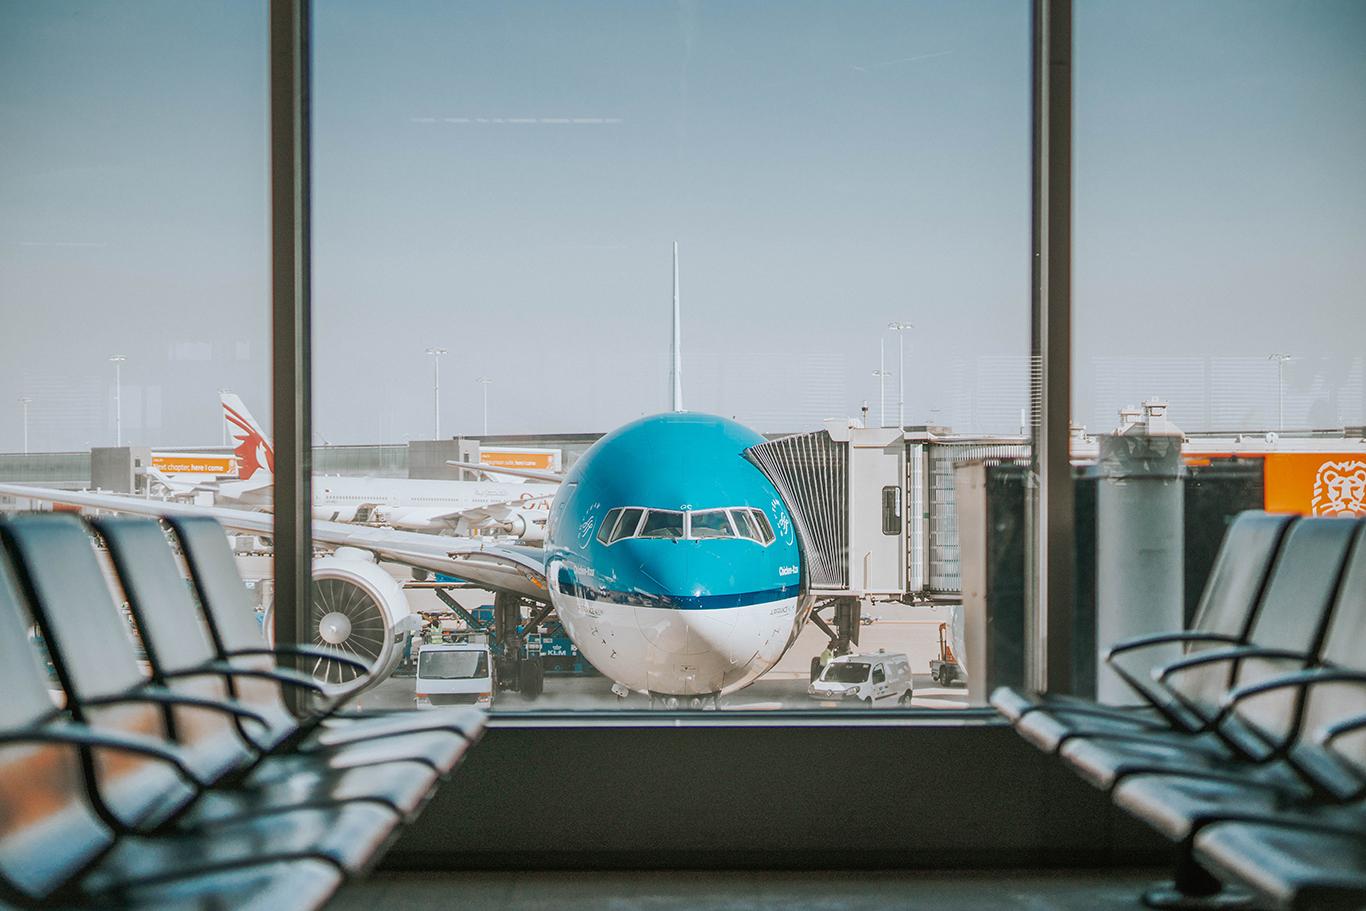 aeroport avion salle d'attente gate